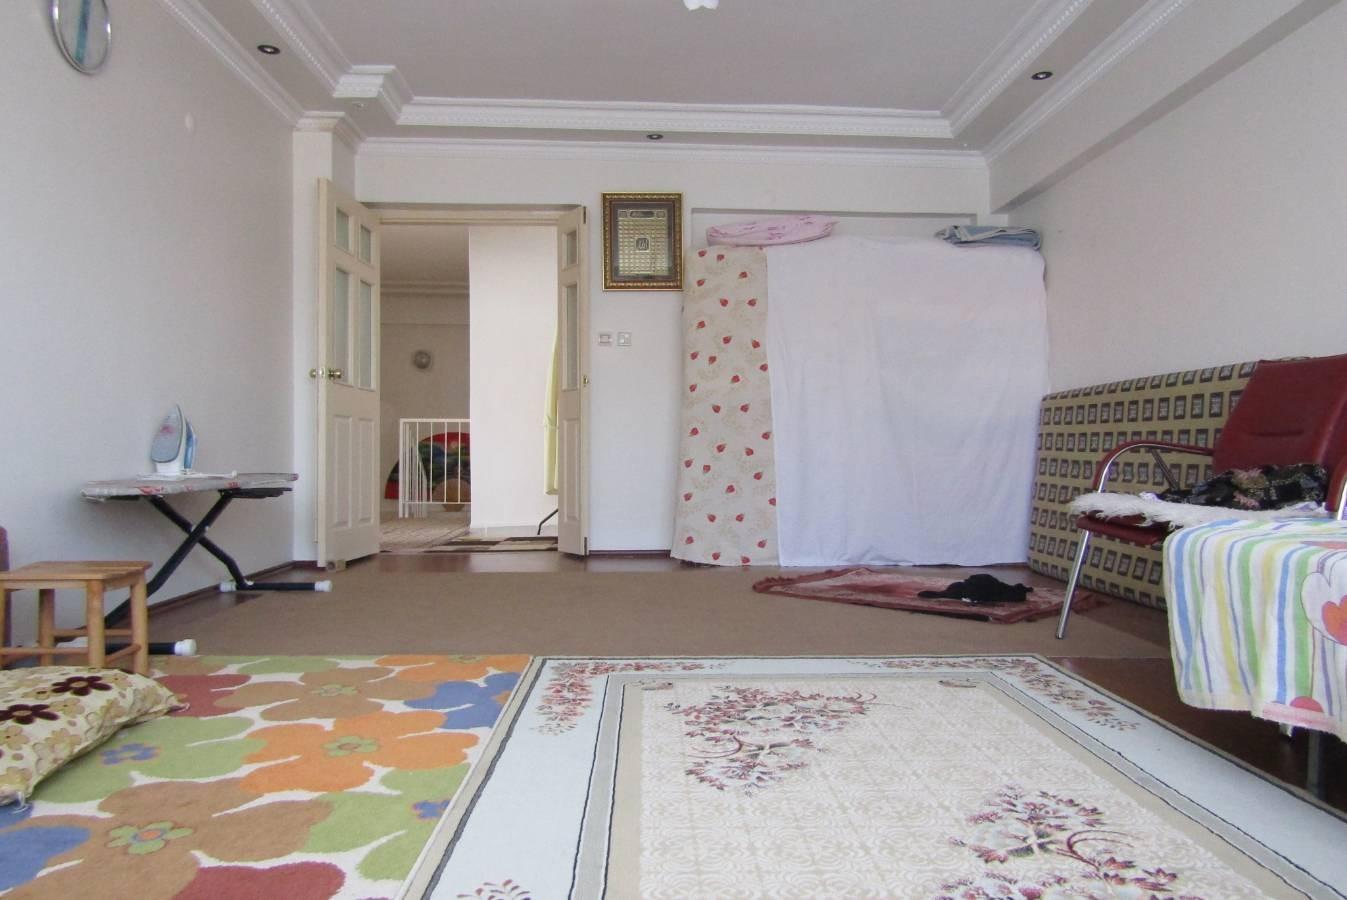 SR EMLAK'TAN ALSANCAK MAH'DE 4+2 240 m² TERAS BAĞIMSIZ DAİRE